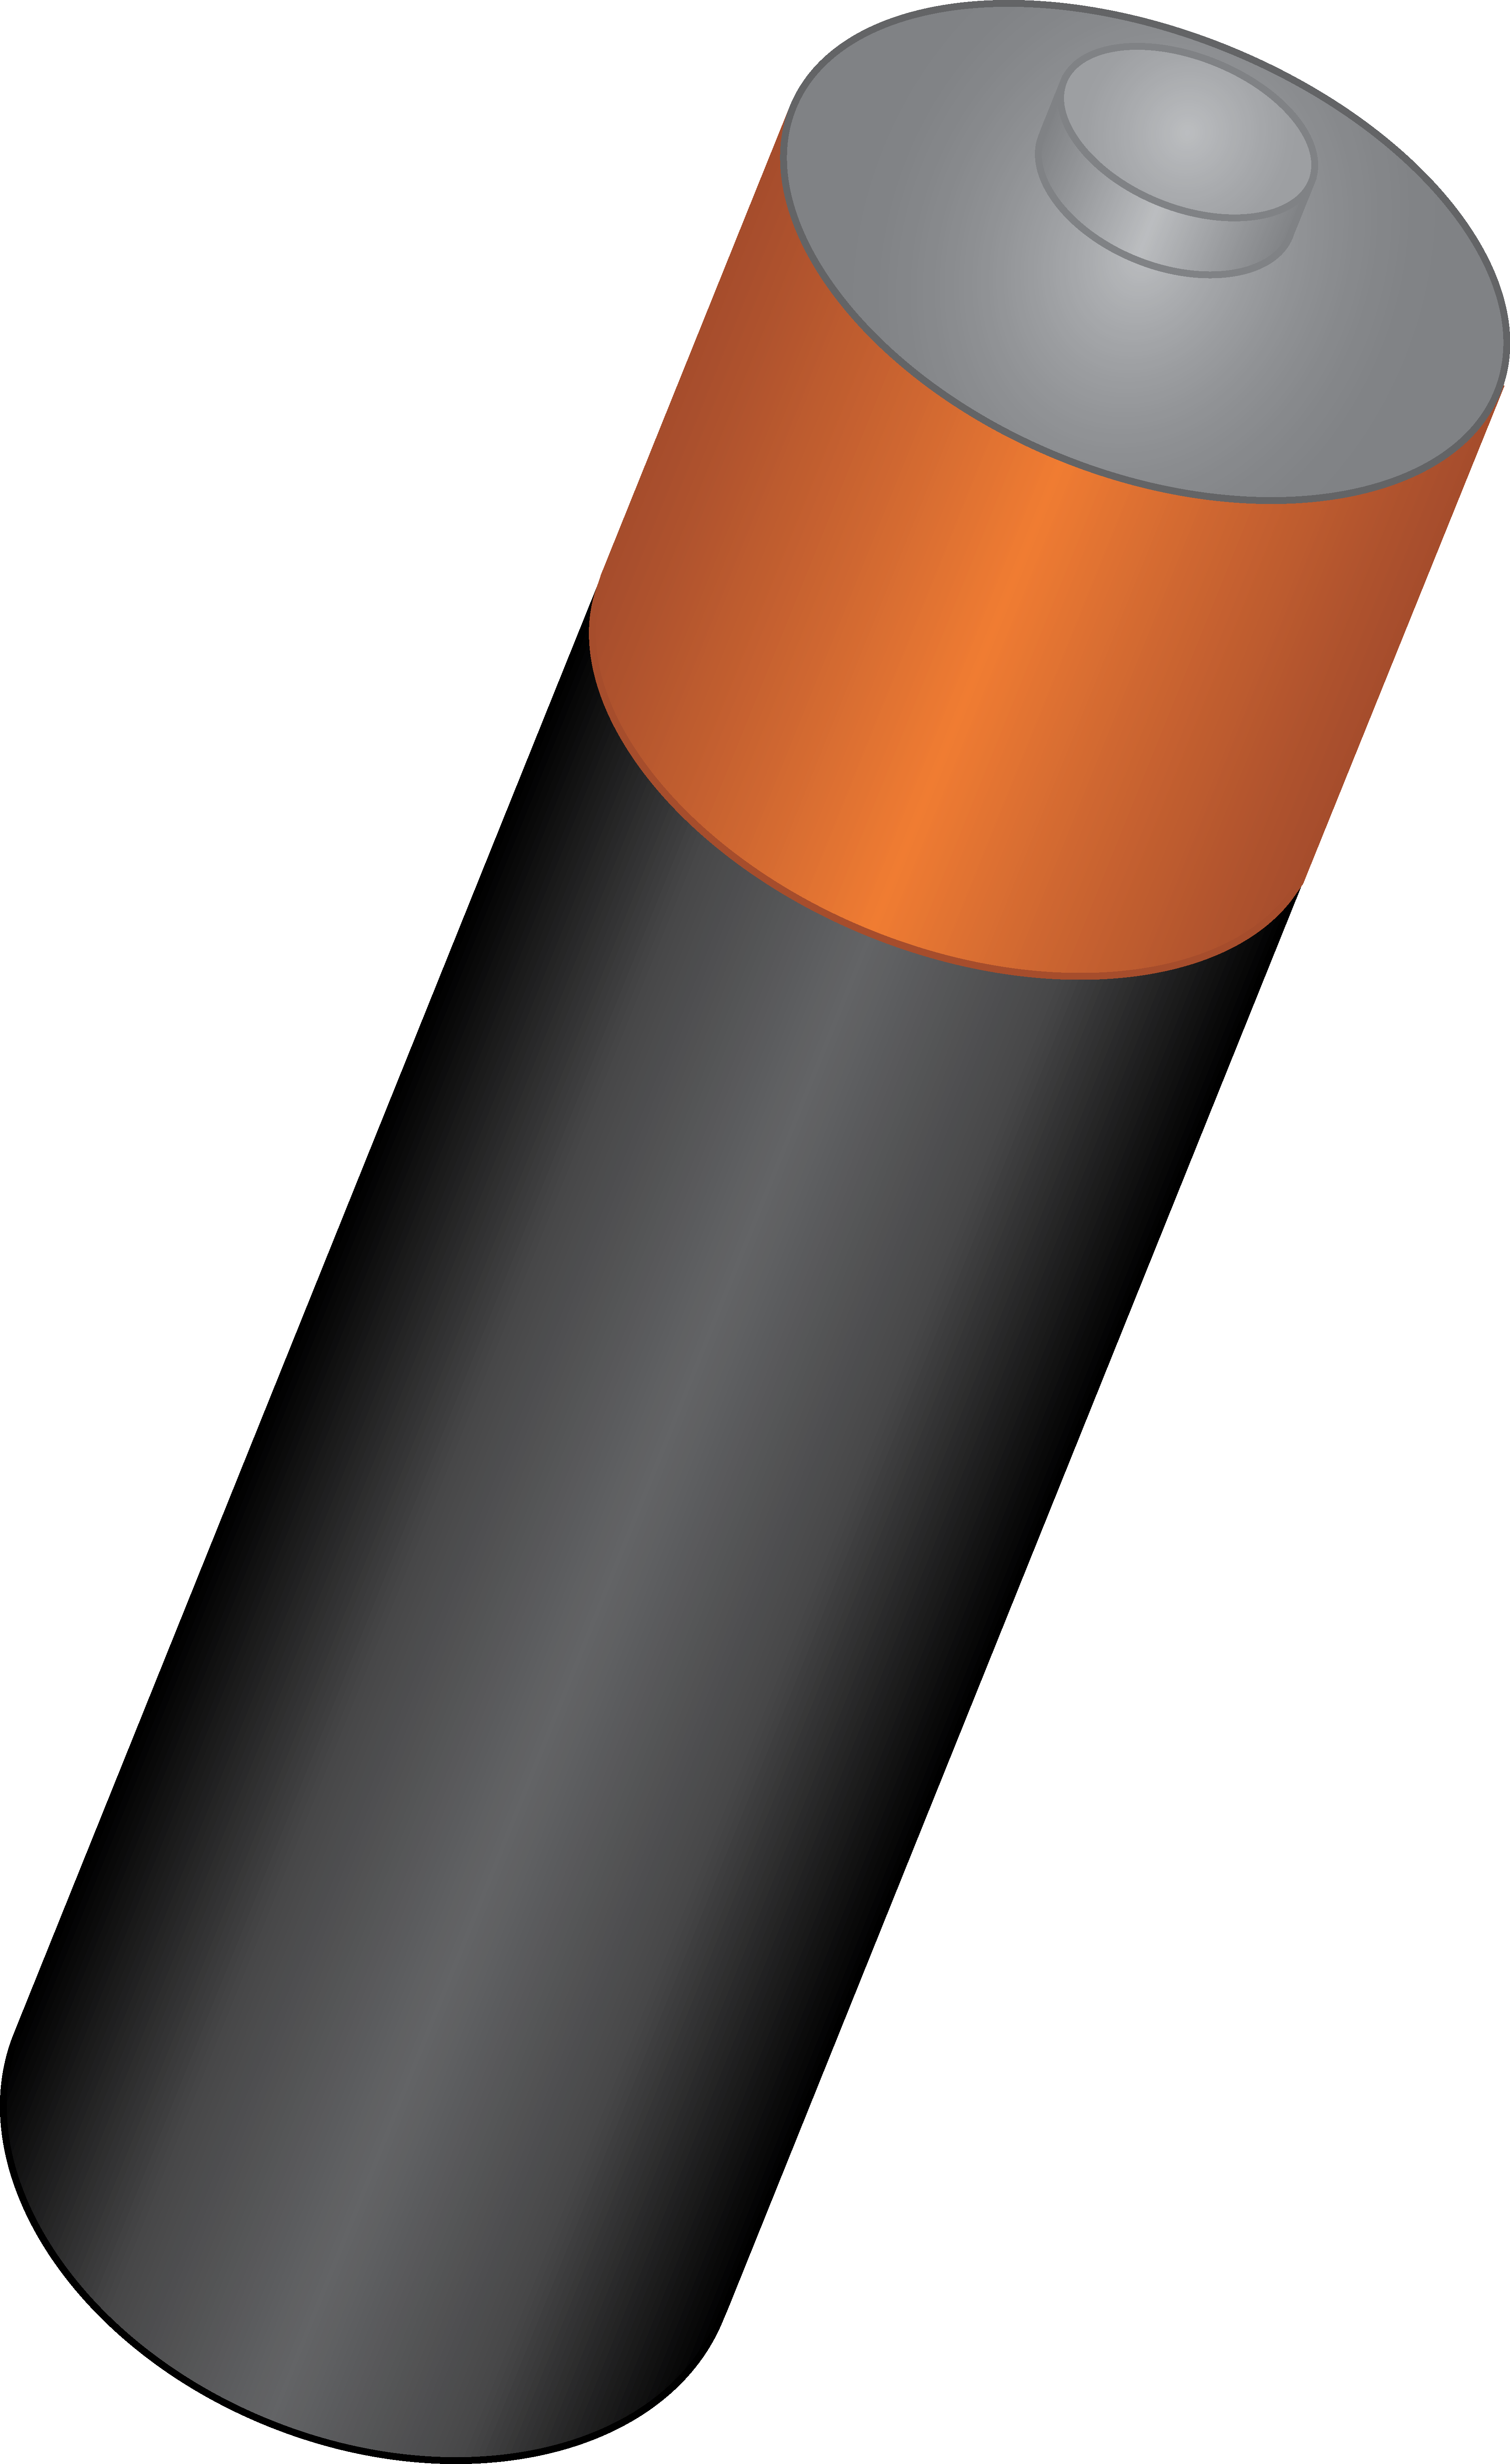 Battery clipart aa battery, Battery aa battery Transparent.